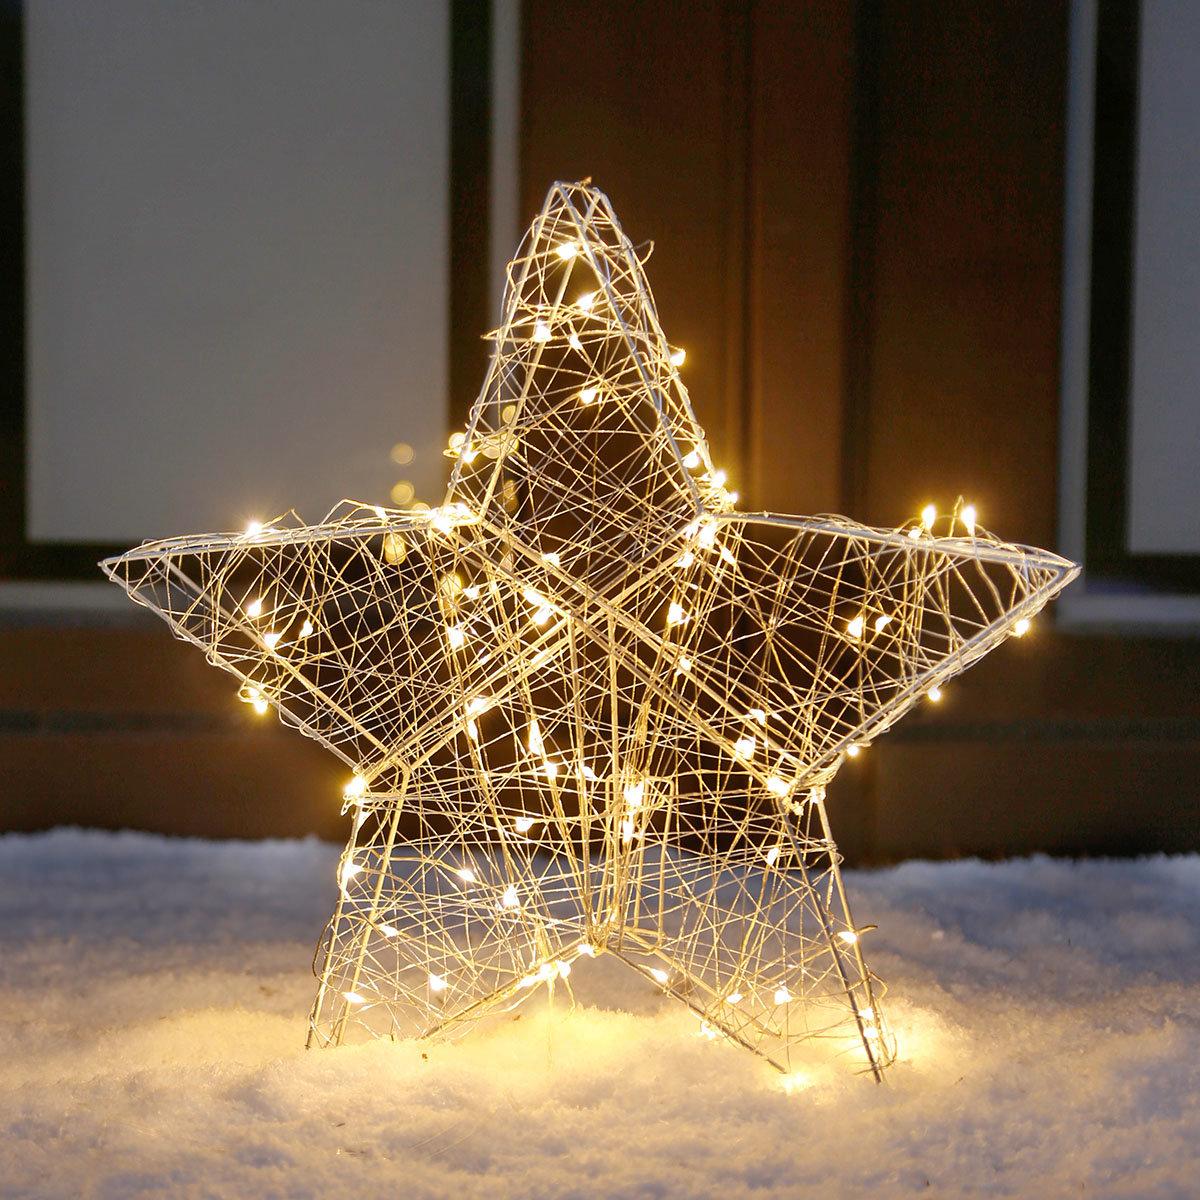 LED-Leuchtstern Deko-Star, klein